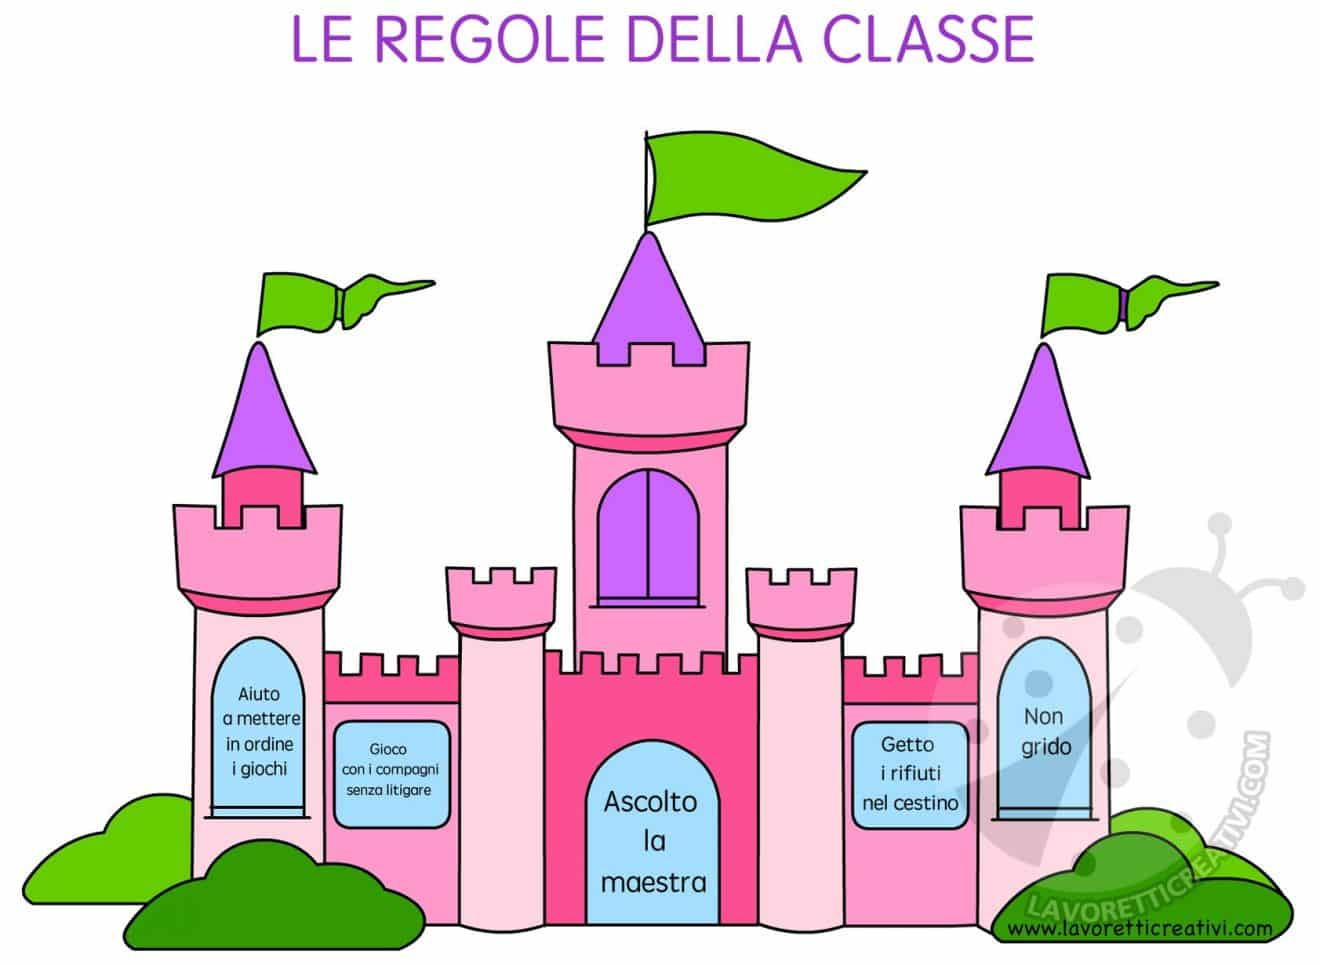 Idee cartellone regole classe - Castello